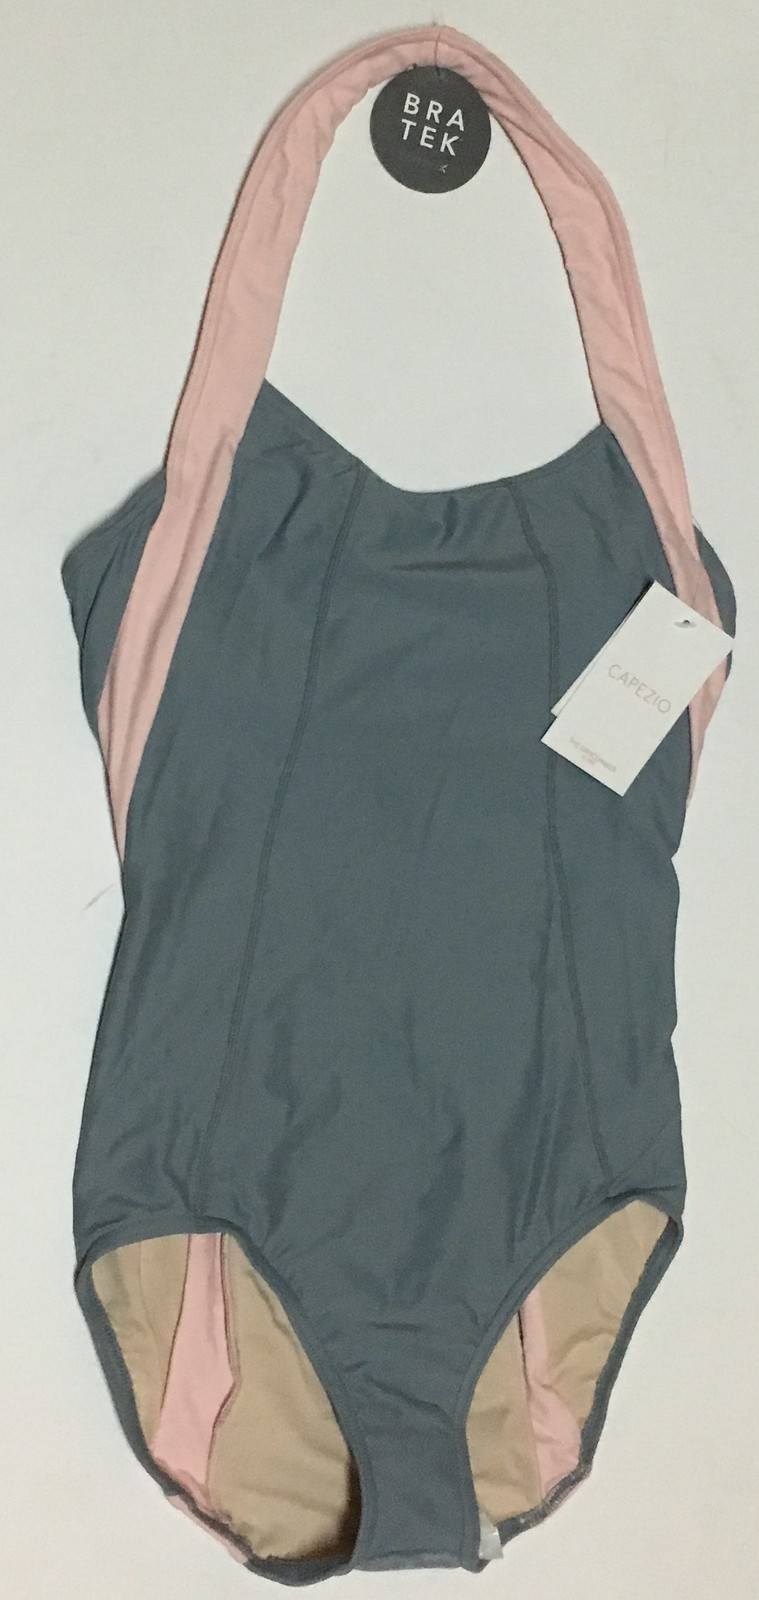 Capezio Bra Tek Dancewear Leotard Various Sizes Gray & Pink NWT